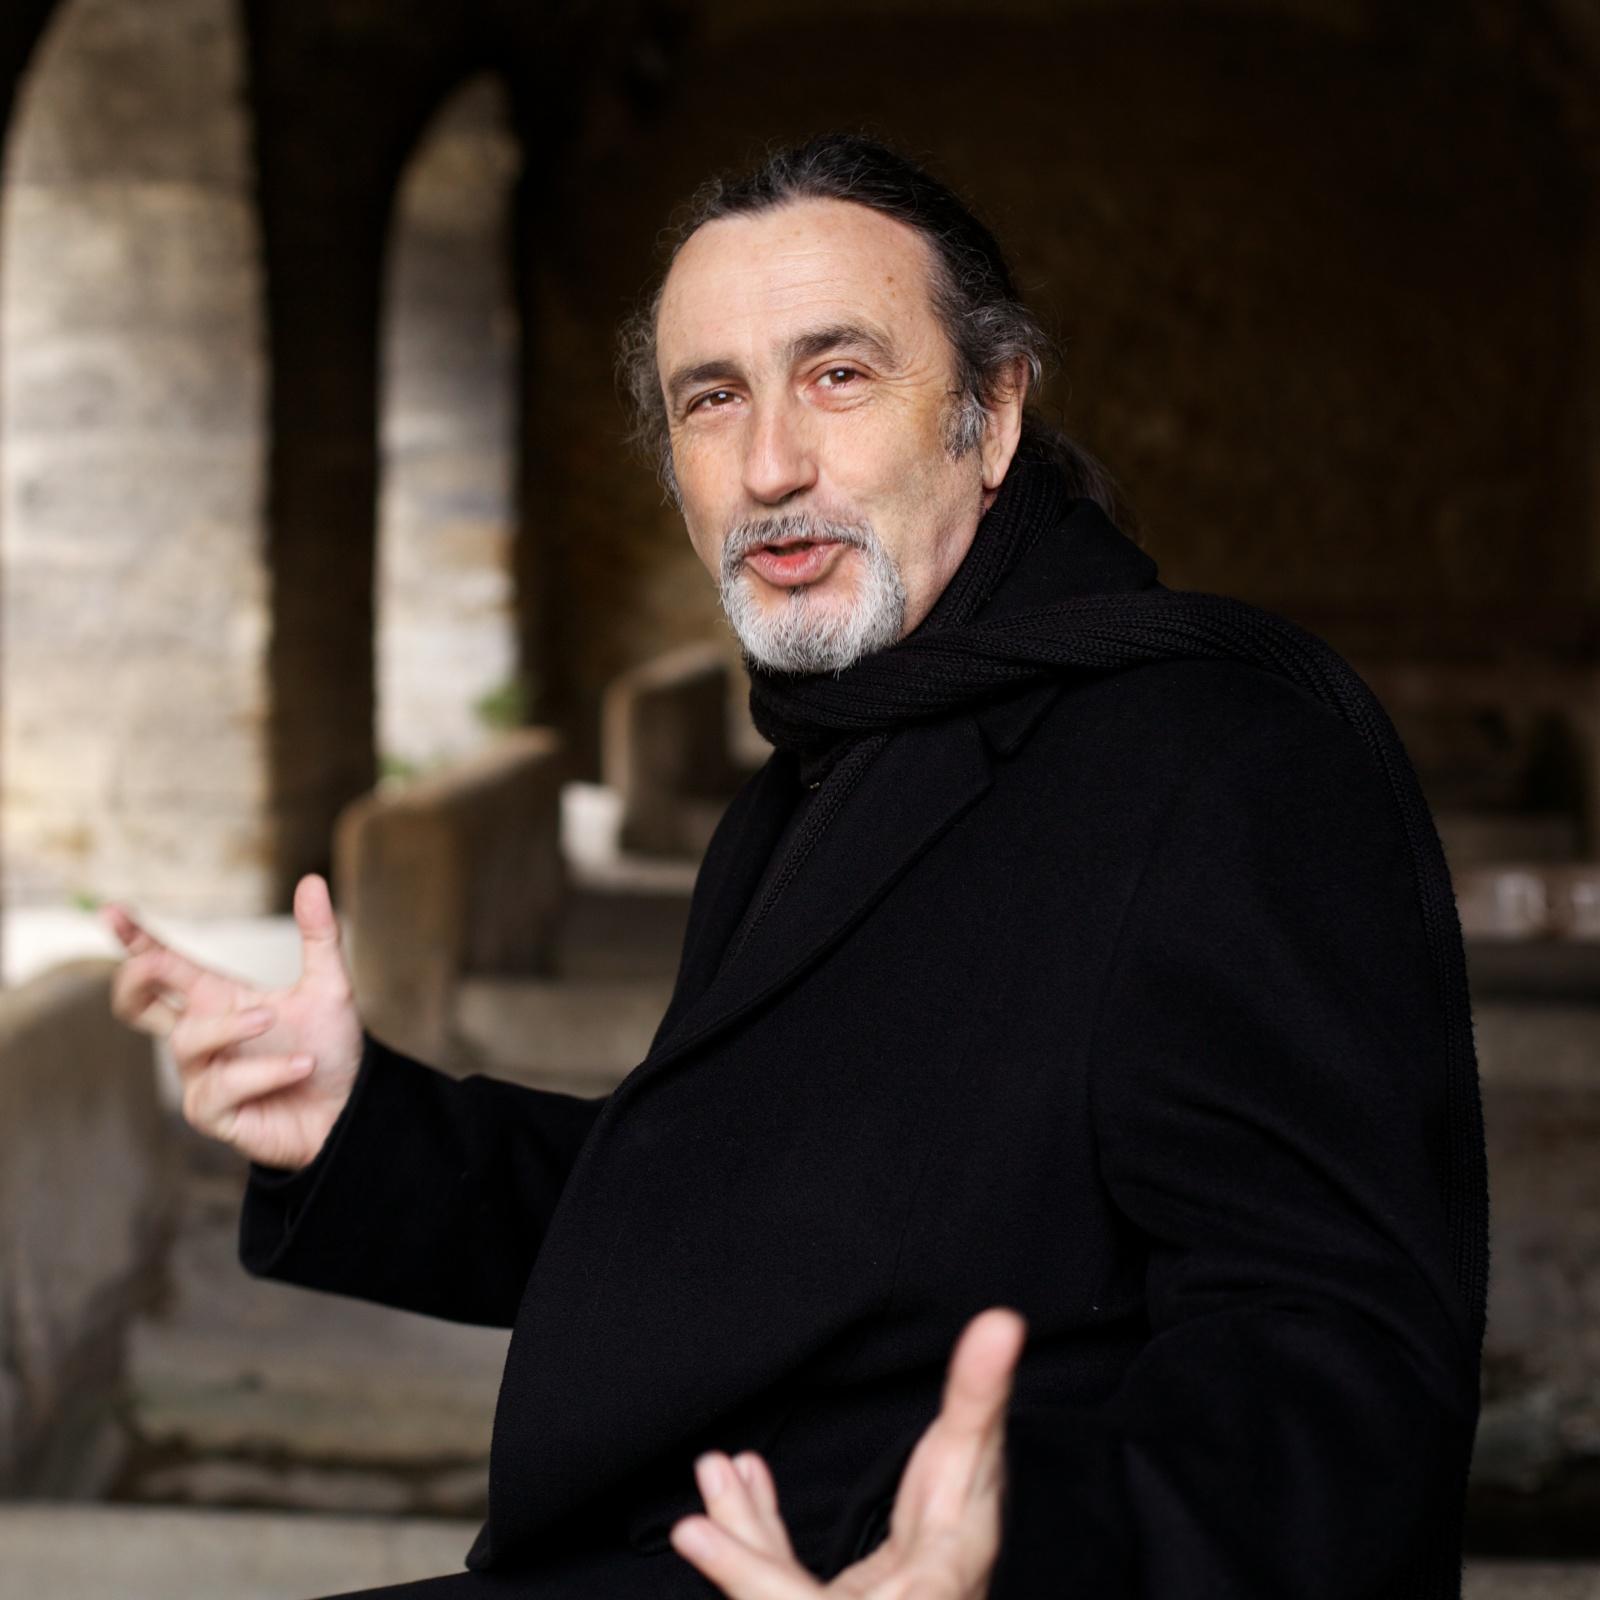 Jean Véronis (c) Benoit Raphael